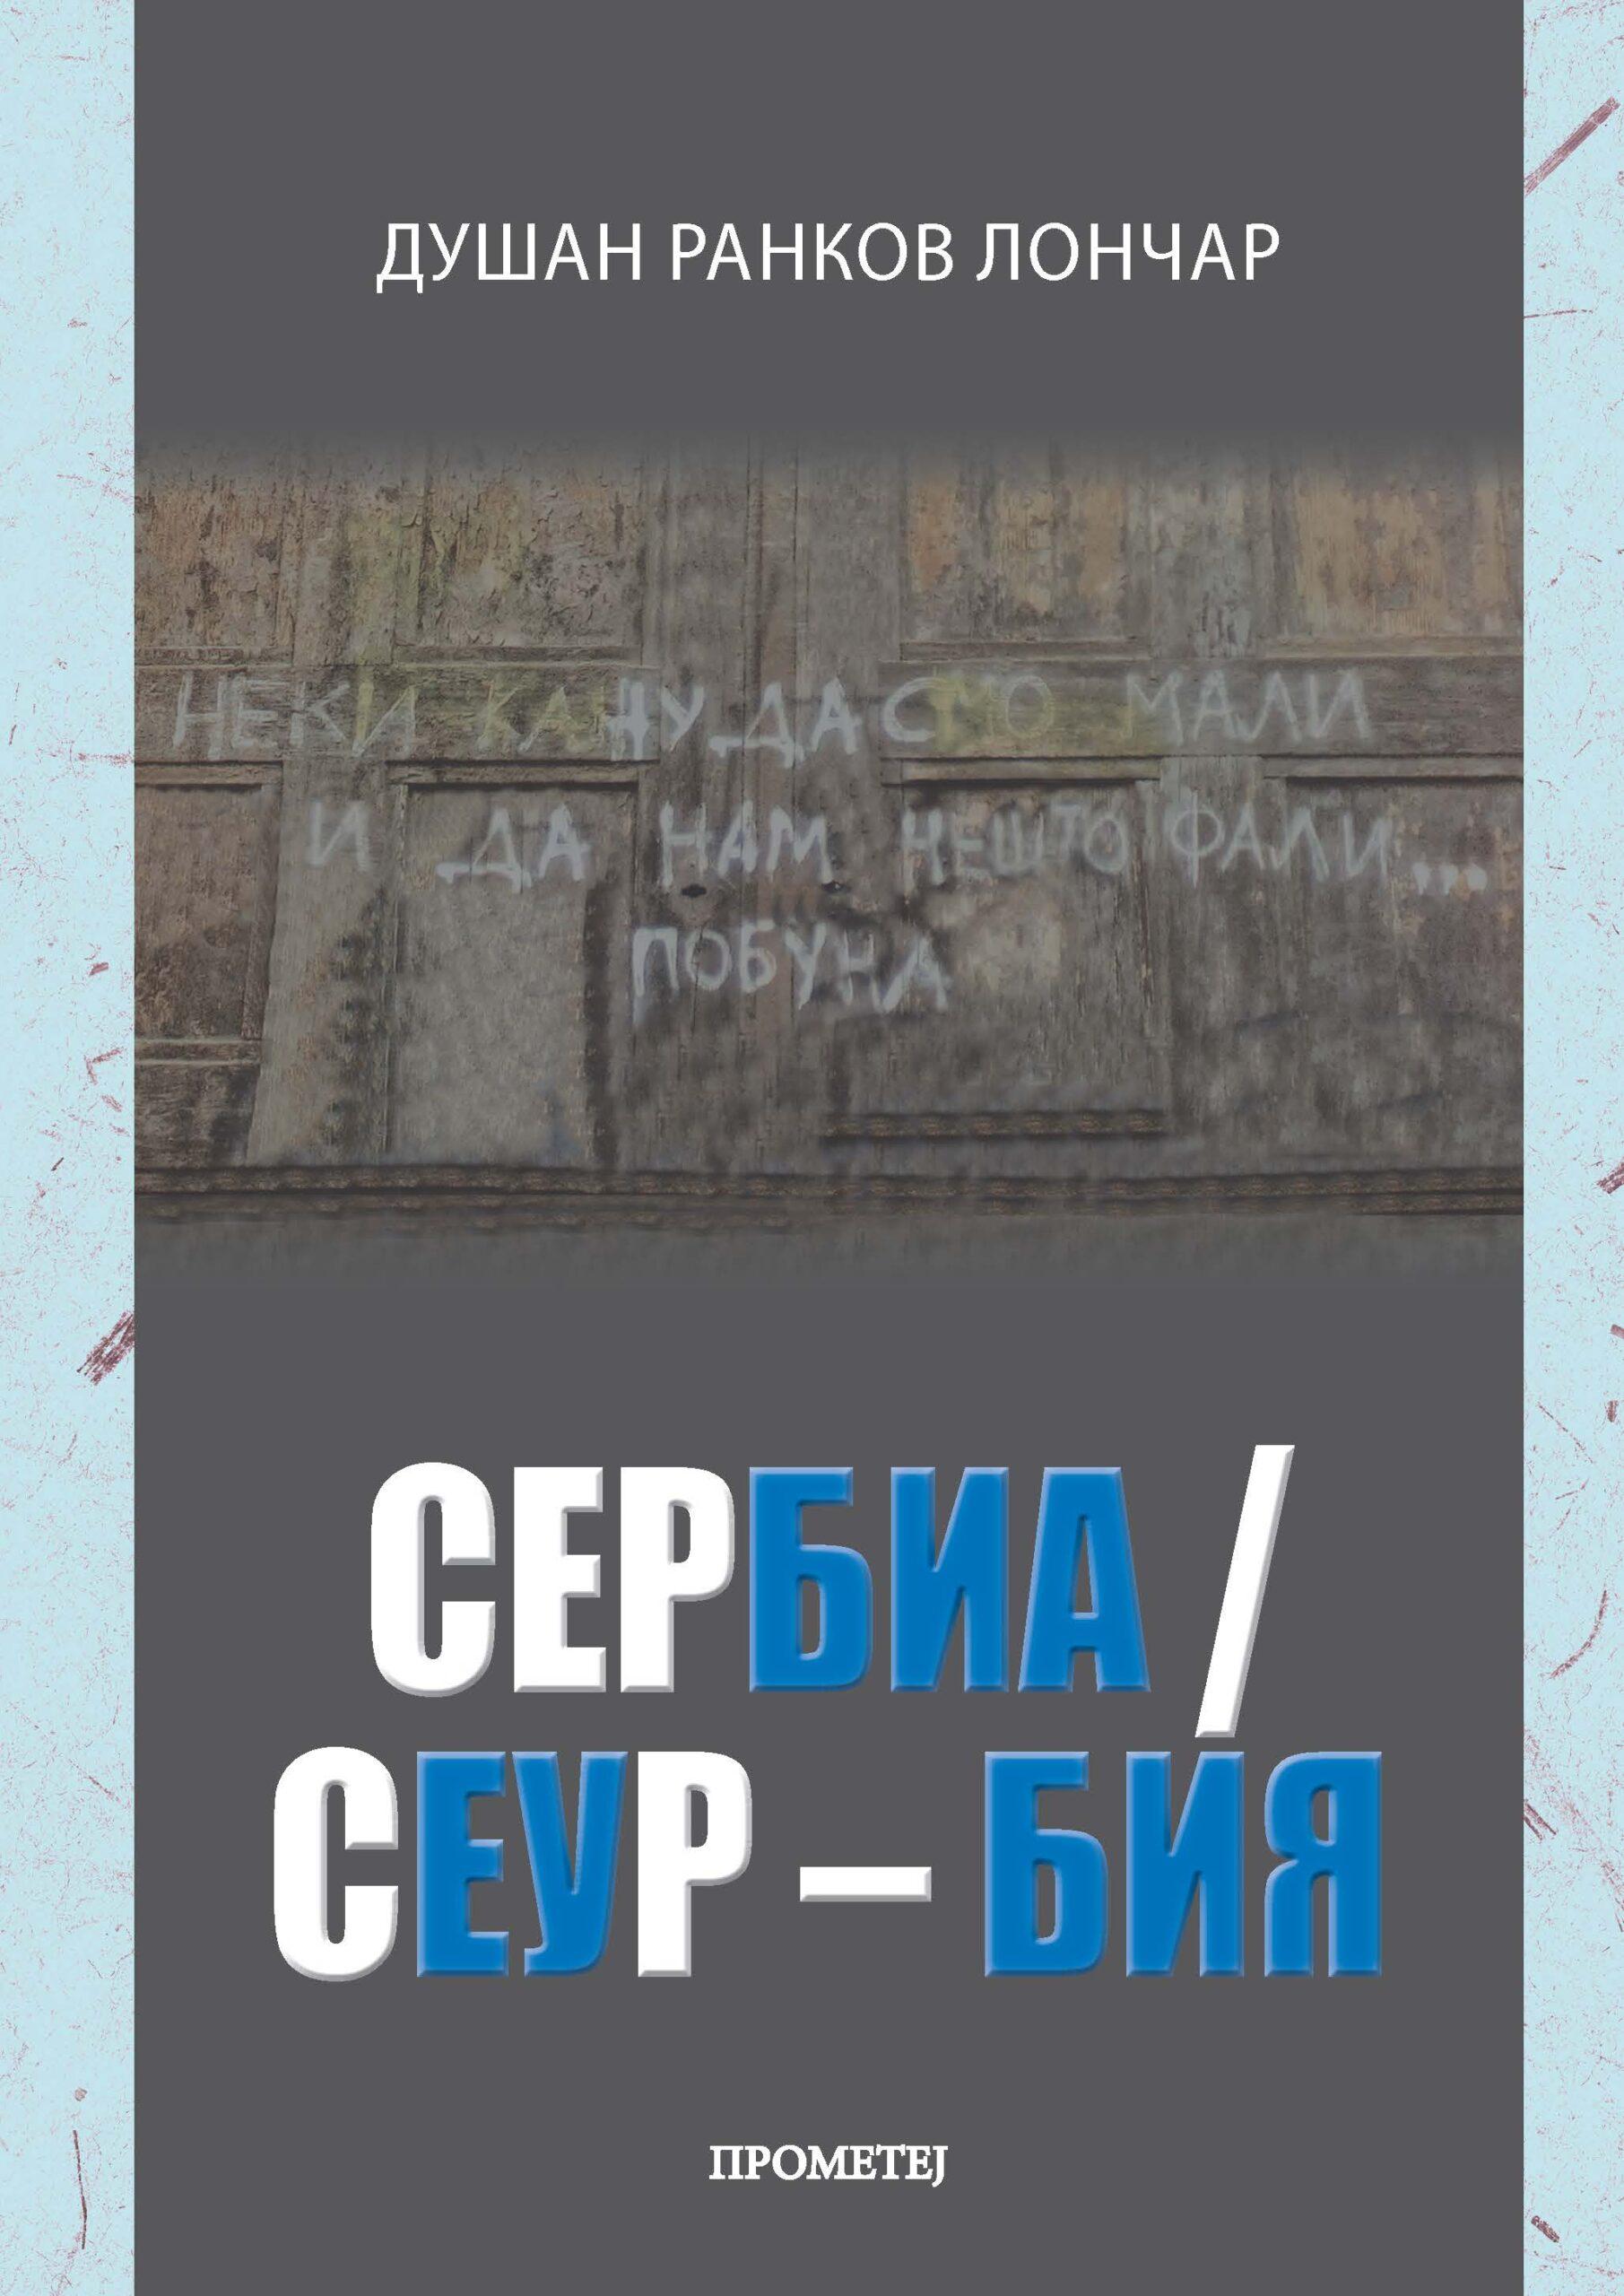 СЕРБИА / СЕУР – БИЯ